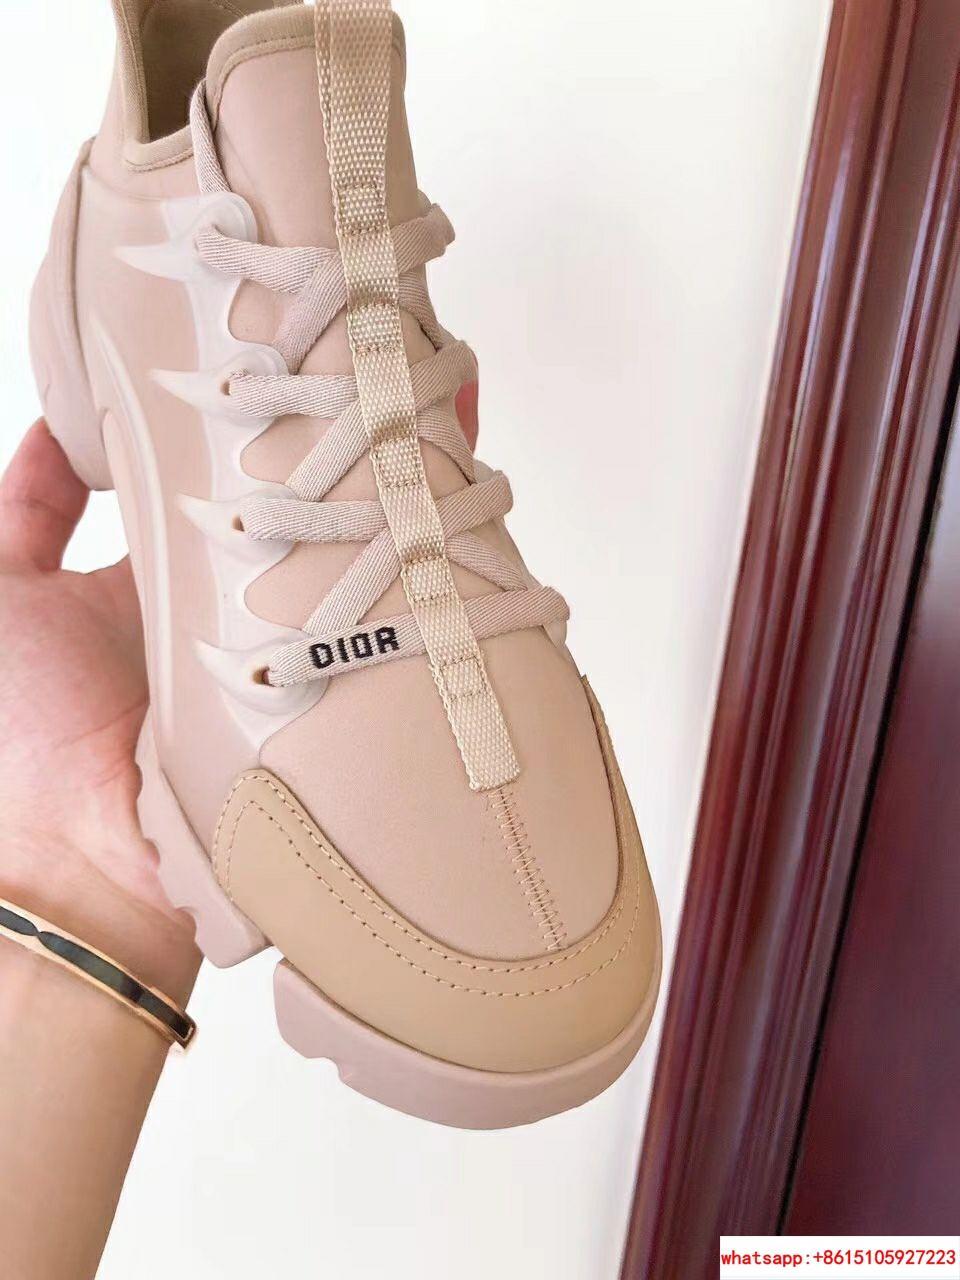 d connect sneaker in Nude Neoprene      women shoes KCK222NGG_S12U 12